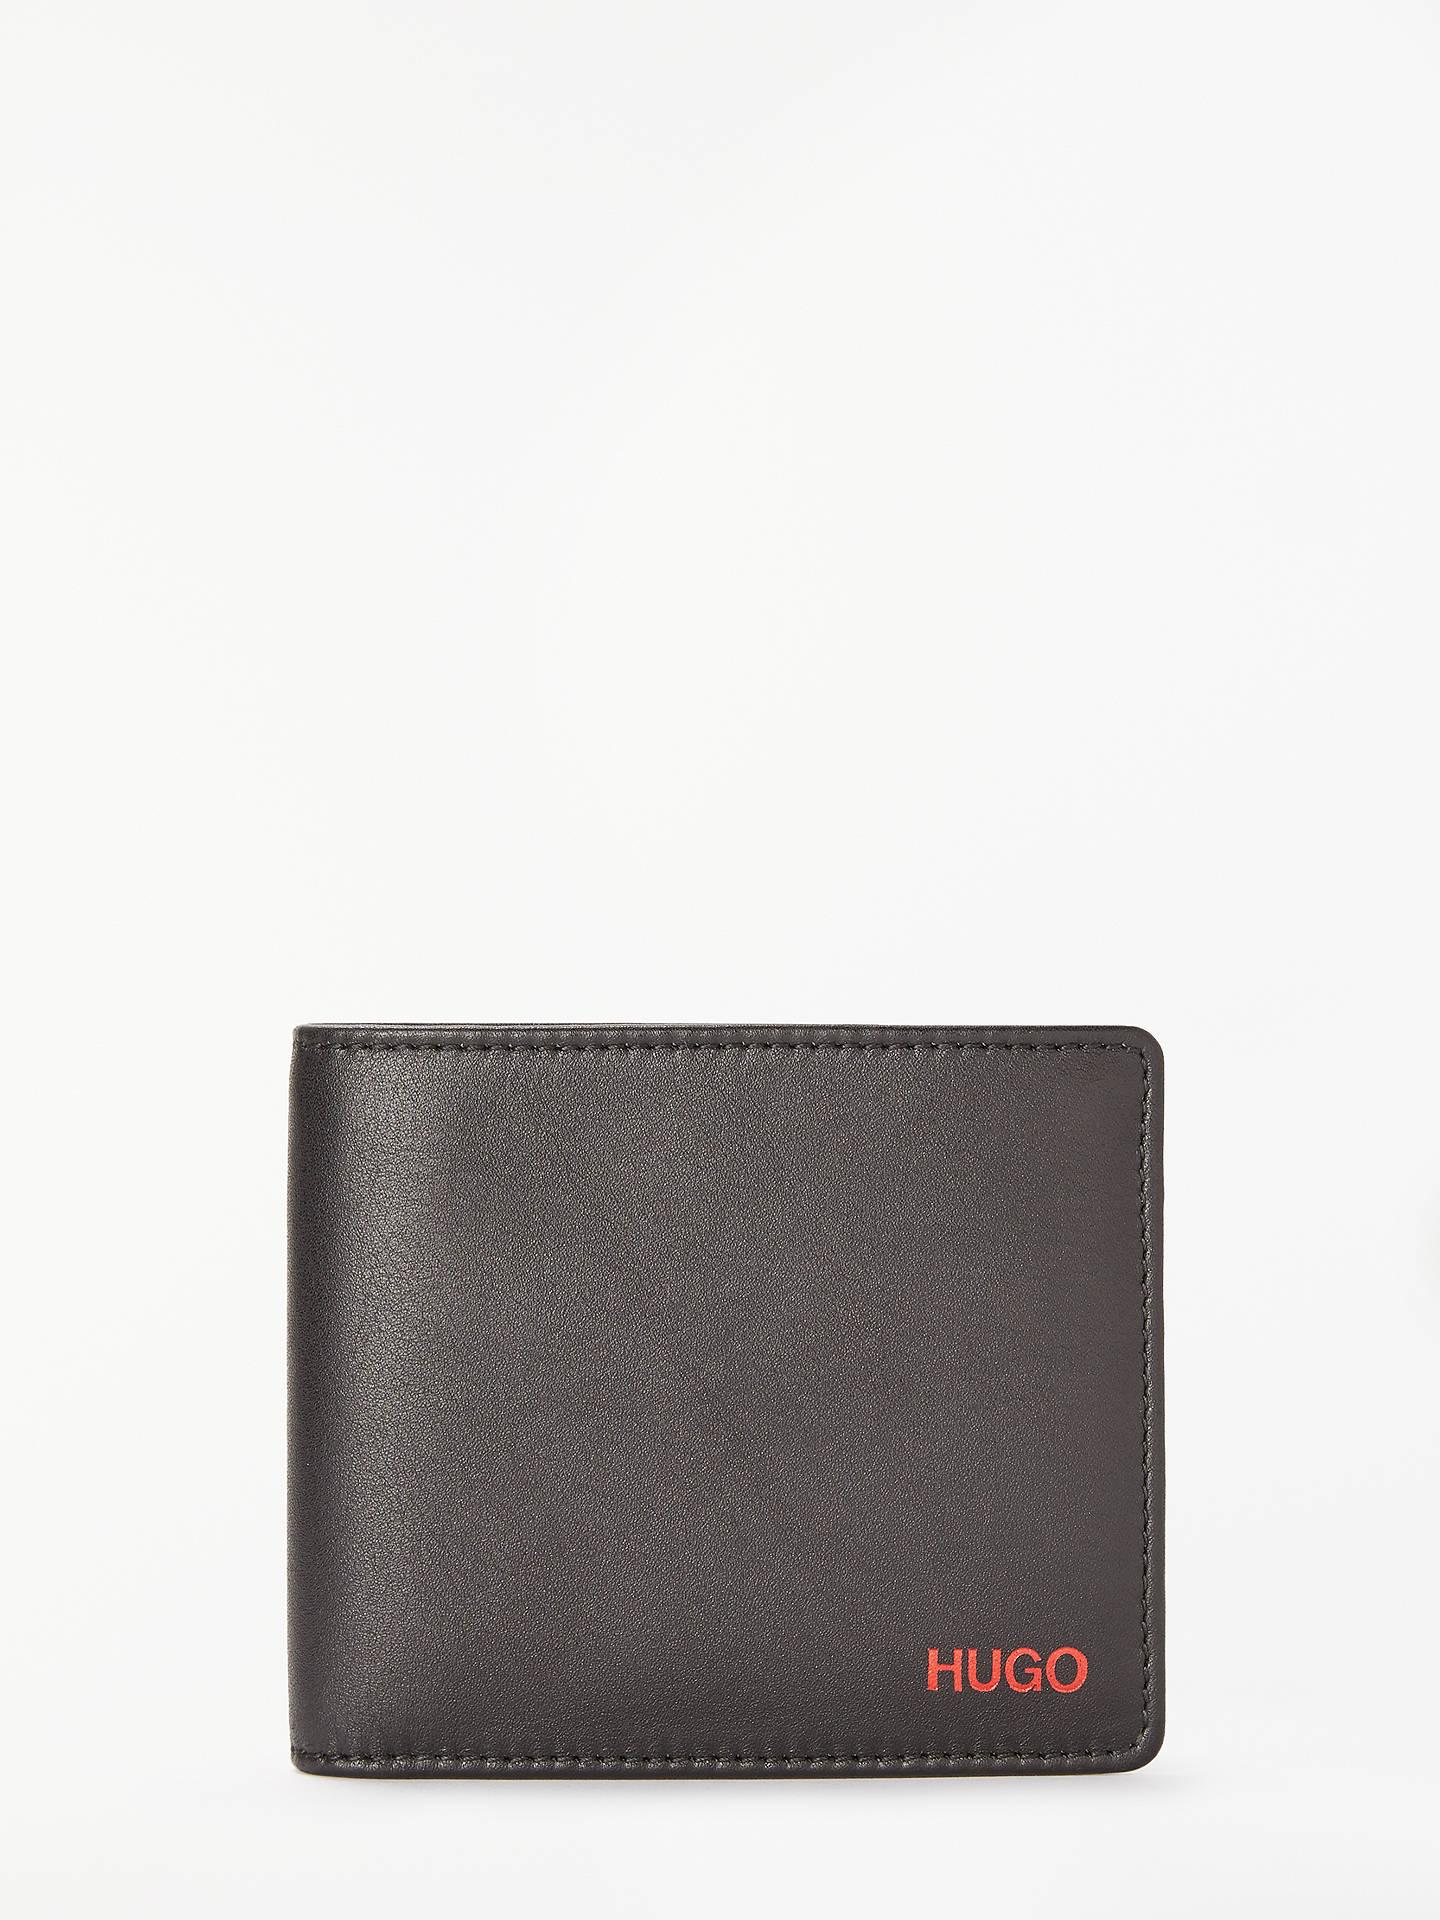 c64fcda838f5d Buy HUGO by Hugo Boss Subway Smooth Leather Bifold Wallet